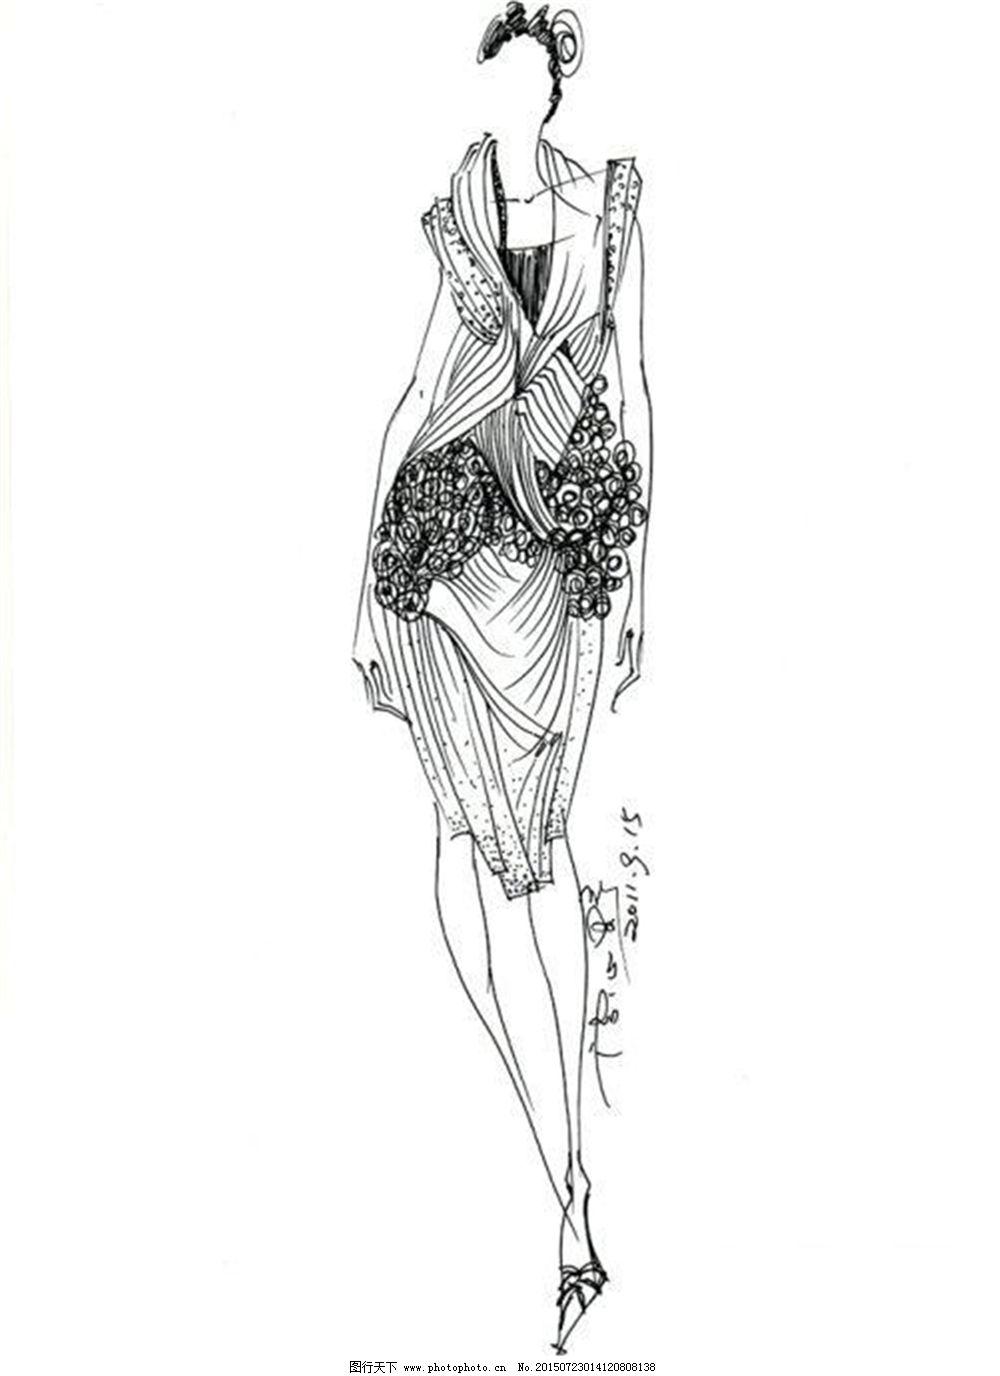 手绘服装设计vb_手绘服装设计